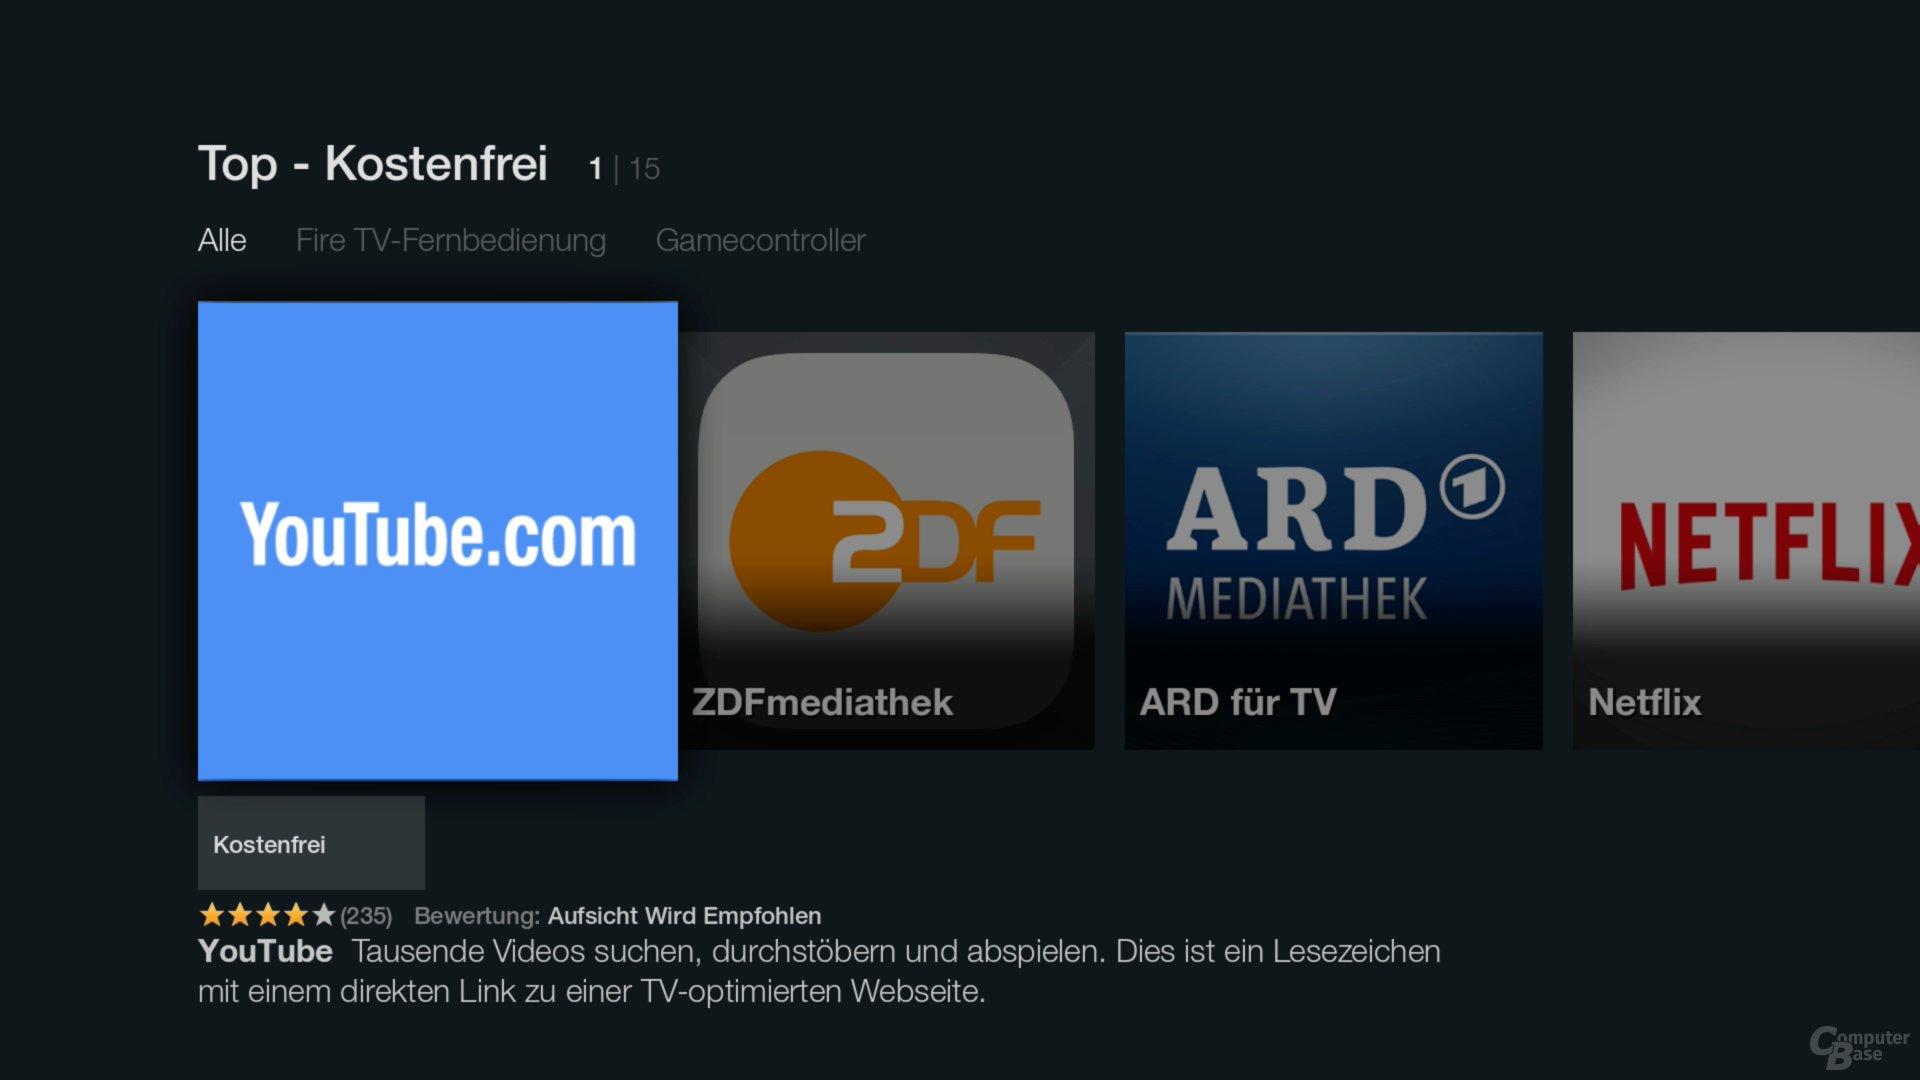 Amazon Fire TV Stick – Mediatheken, Netflix und YouTube